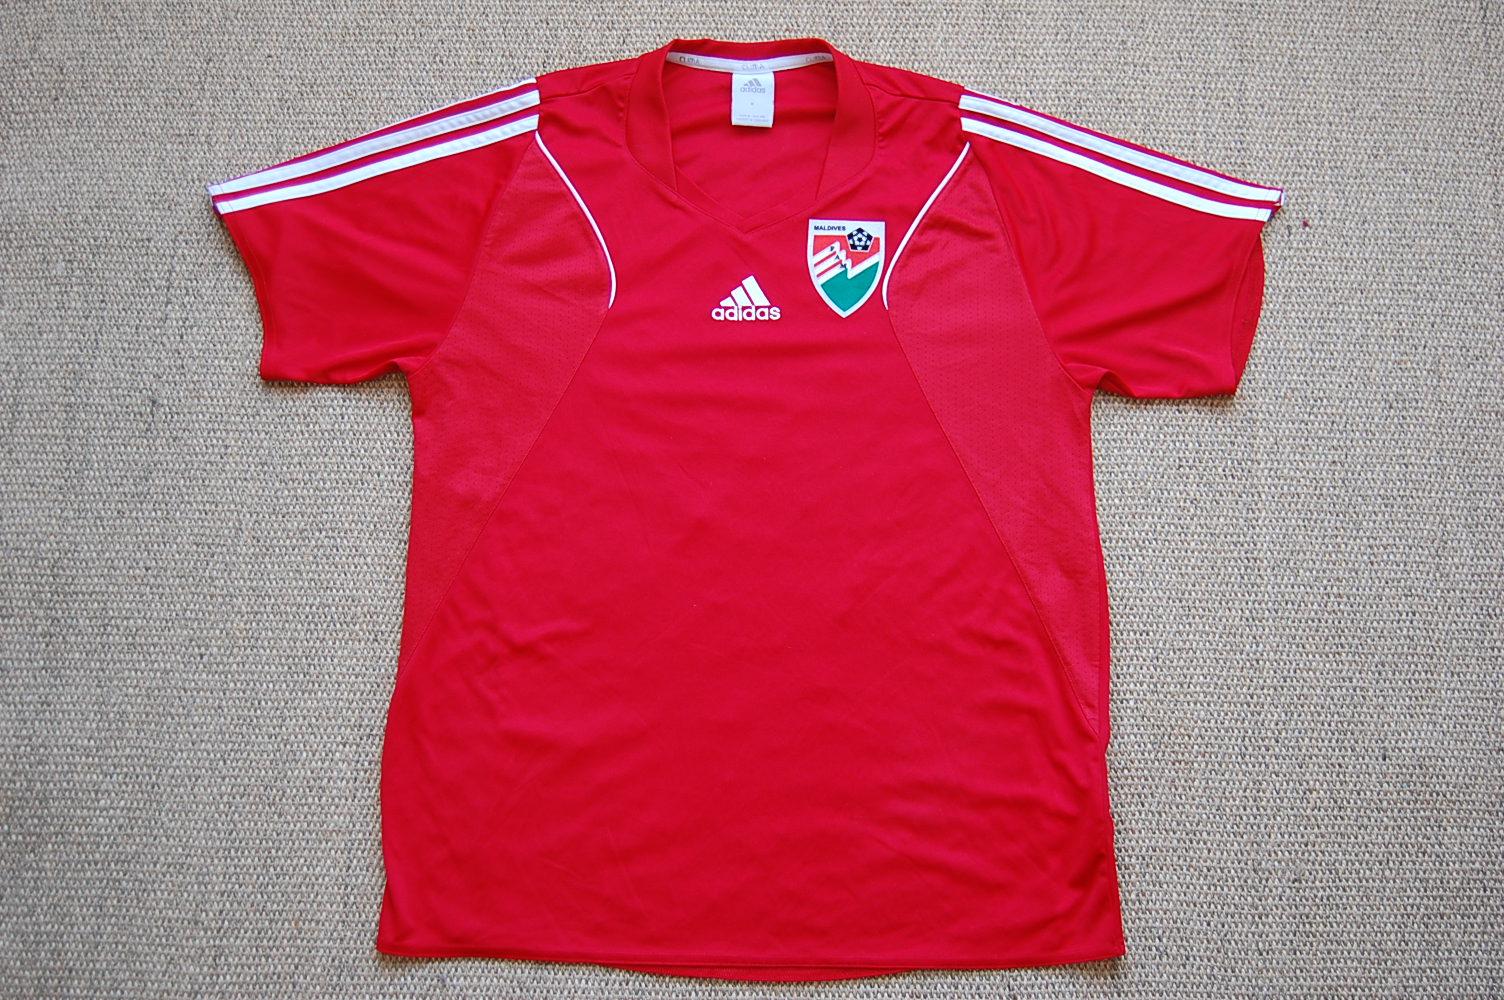 maldives football shirt.JPG